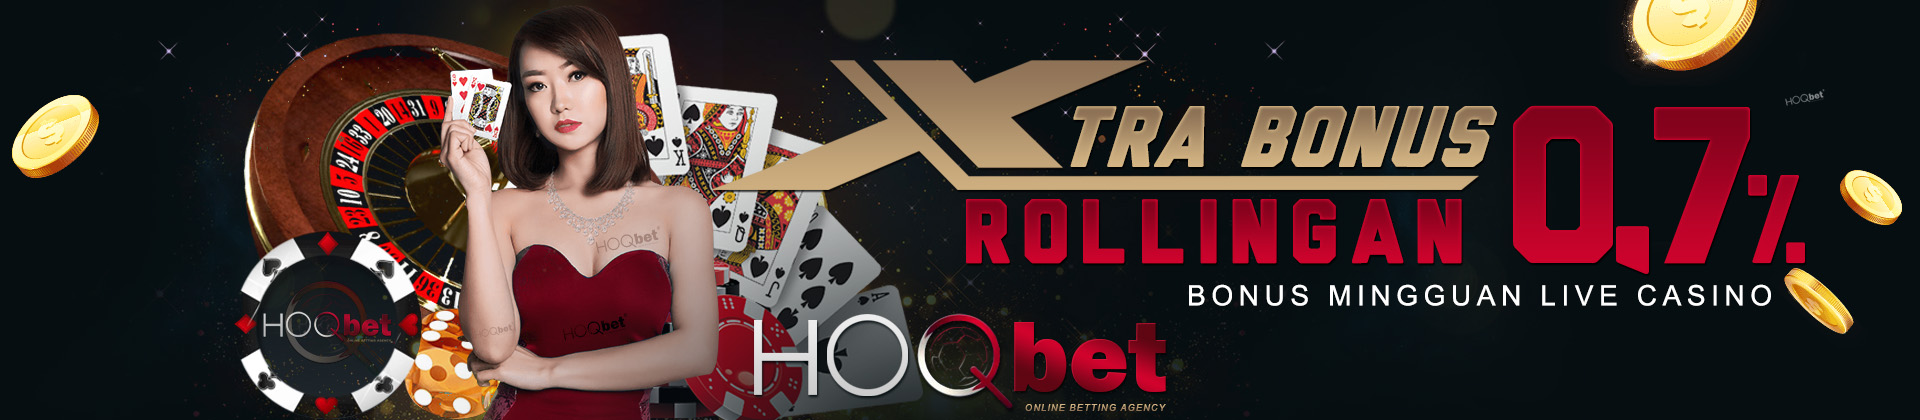 Rollingan Casino X-TRA